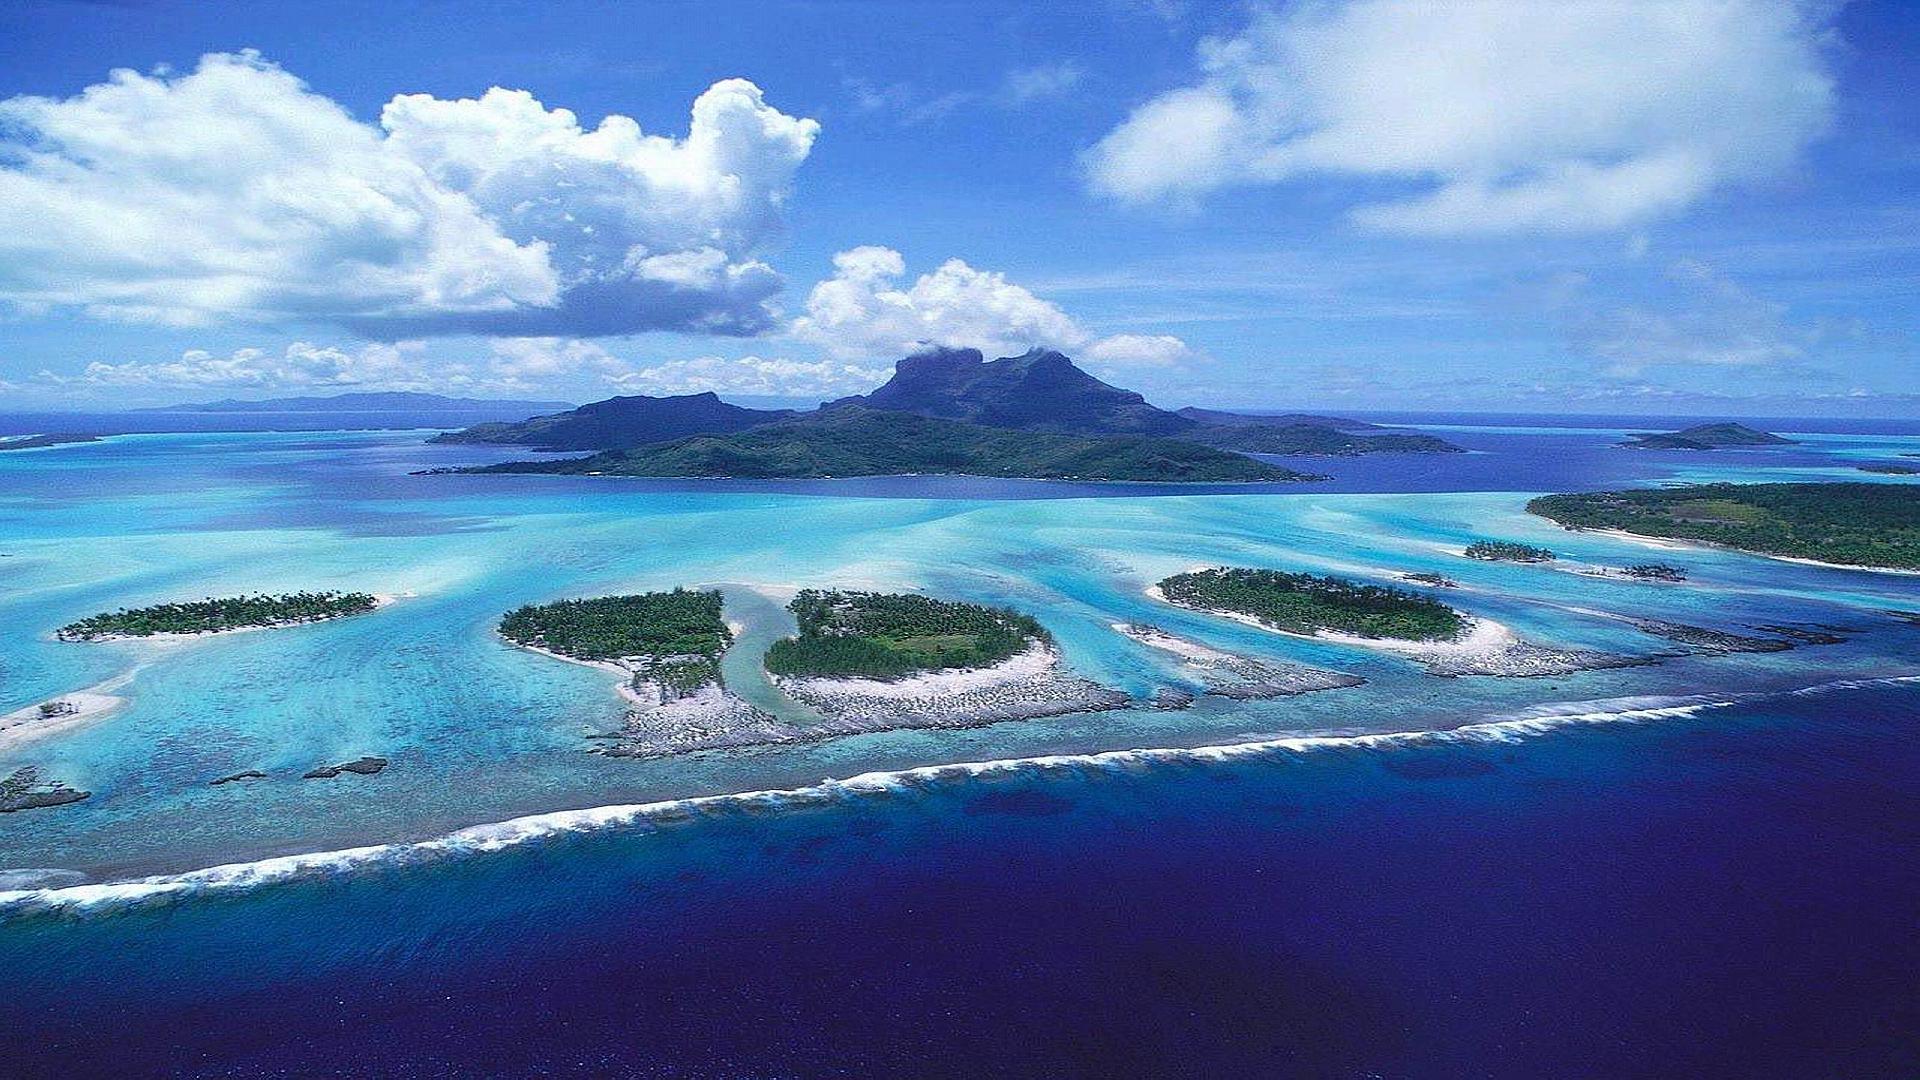 Tropical Islands Blue Ocean Wallpapers Photo 1920x1080